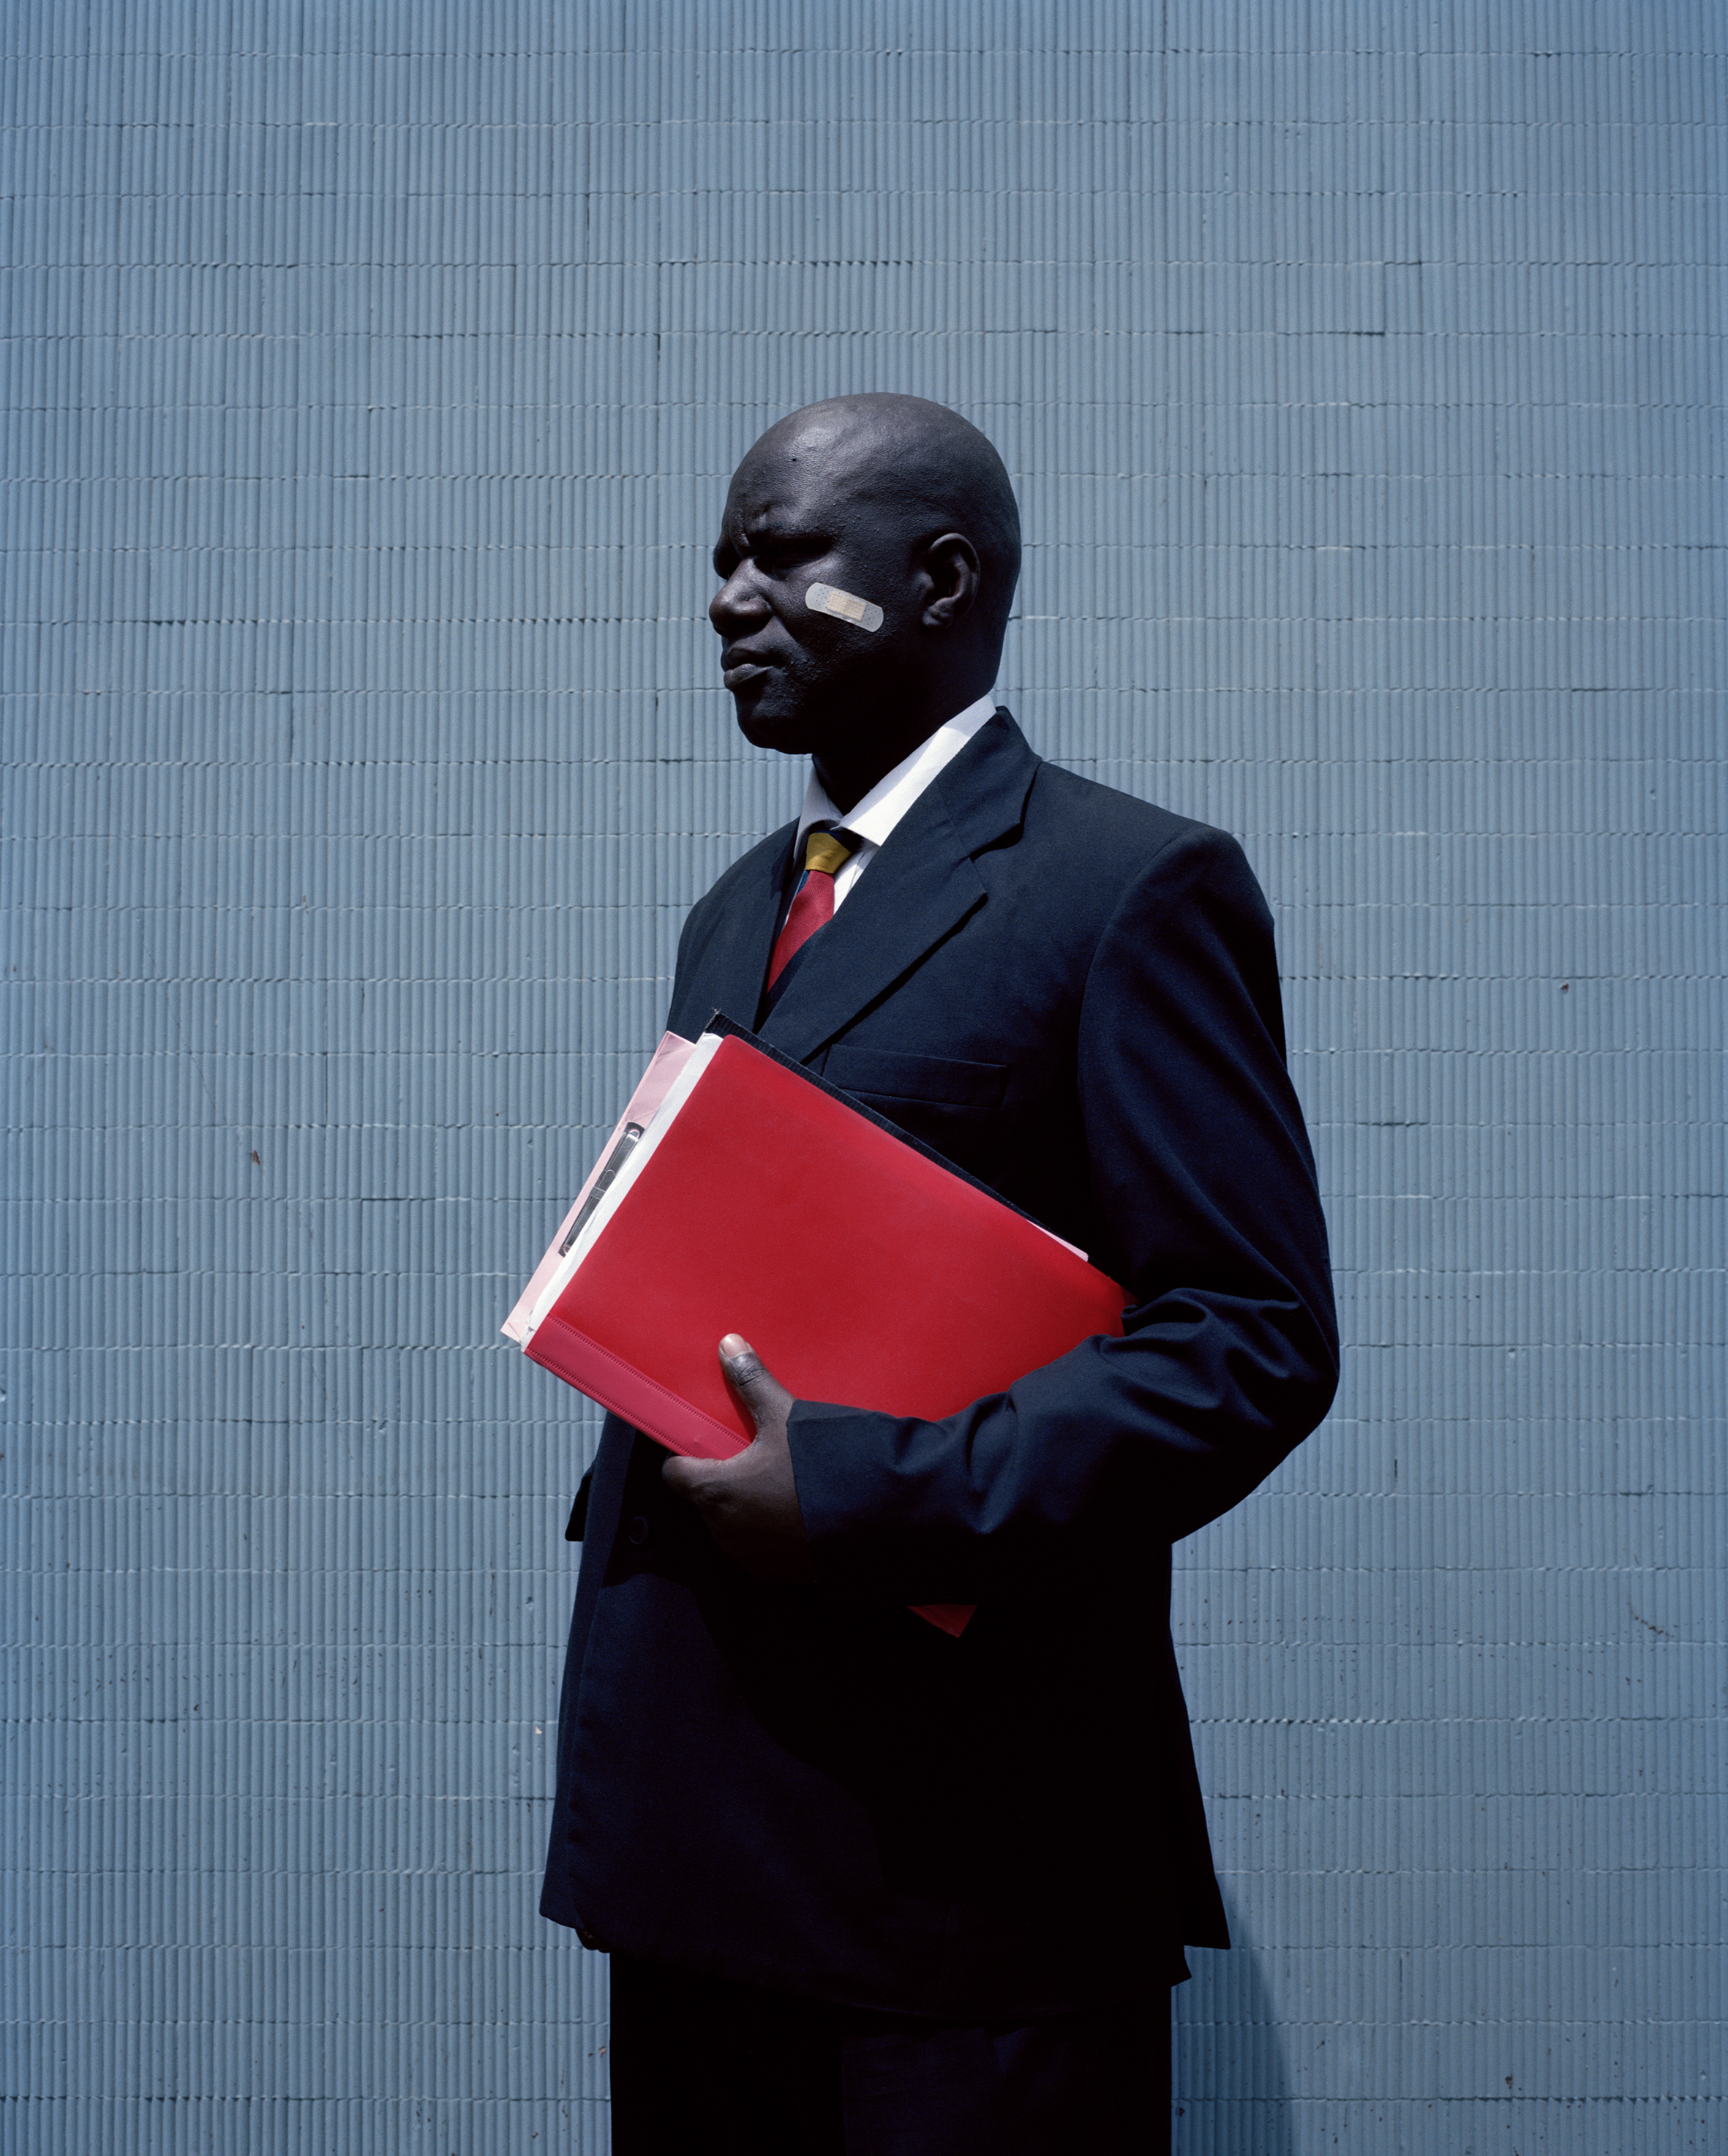 """George David Otieno Obiero"", fot. Viviane Sassen (źródło: materiały organizatorów)"